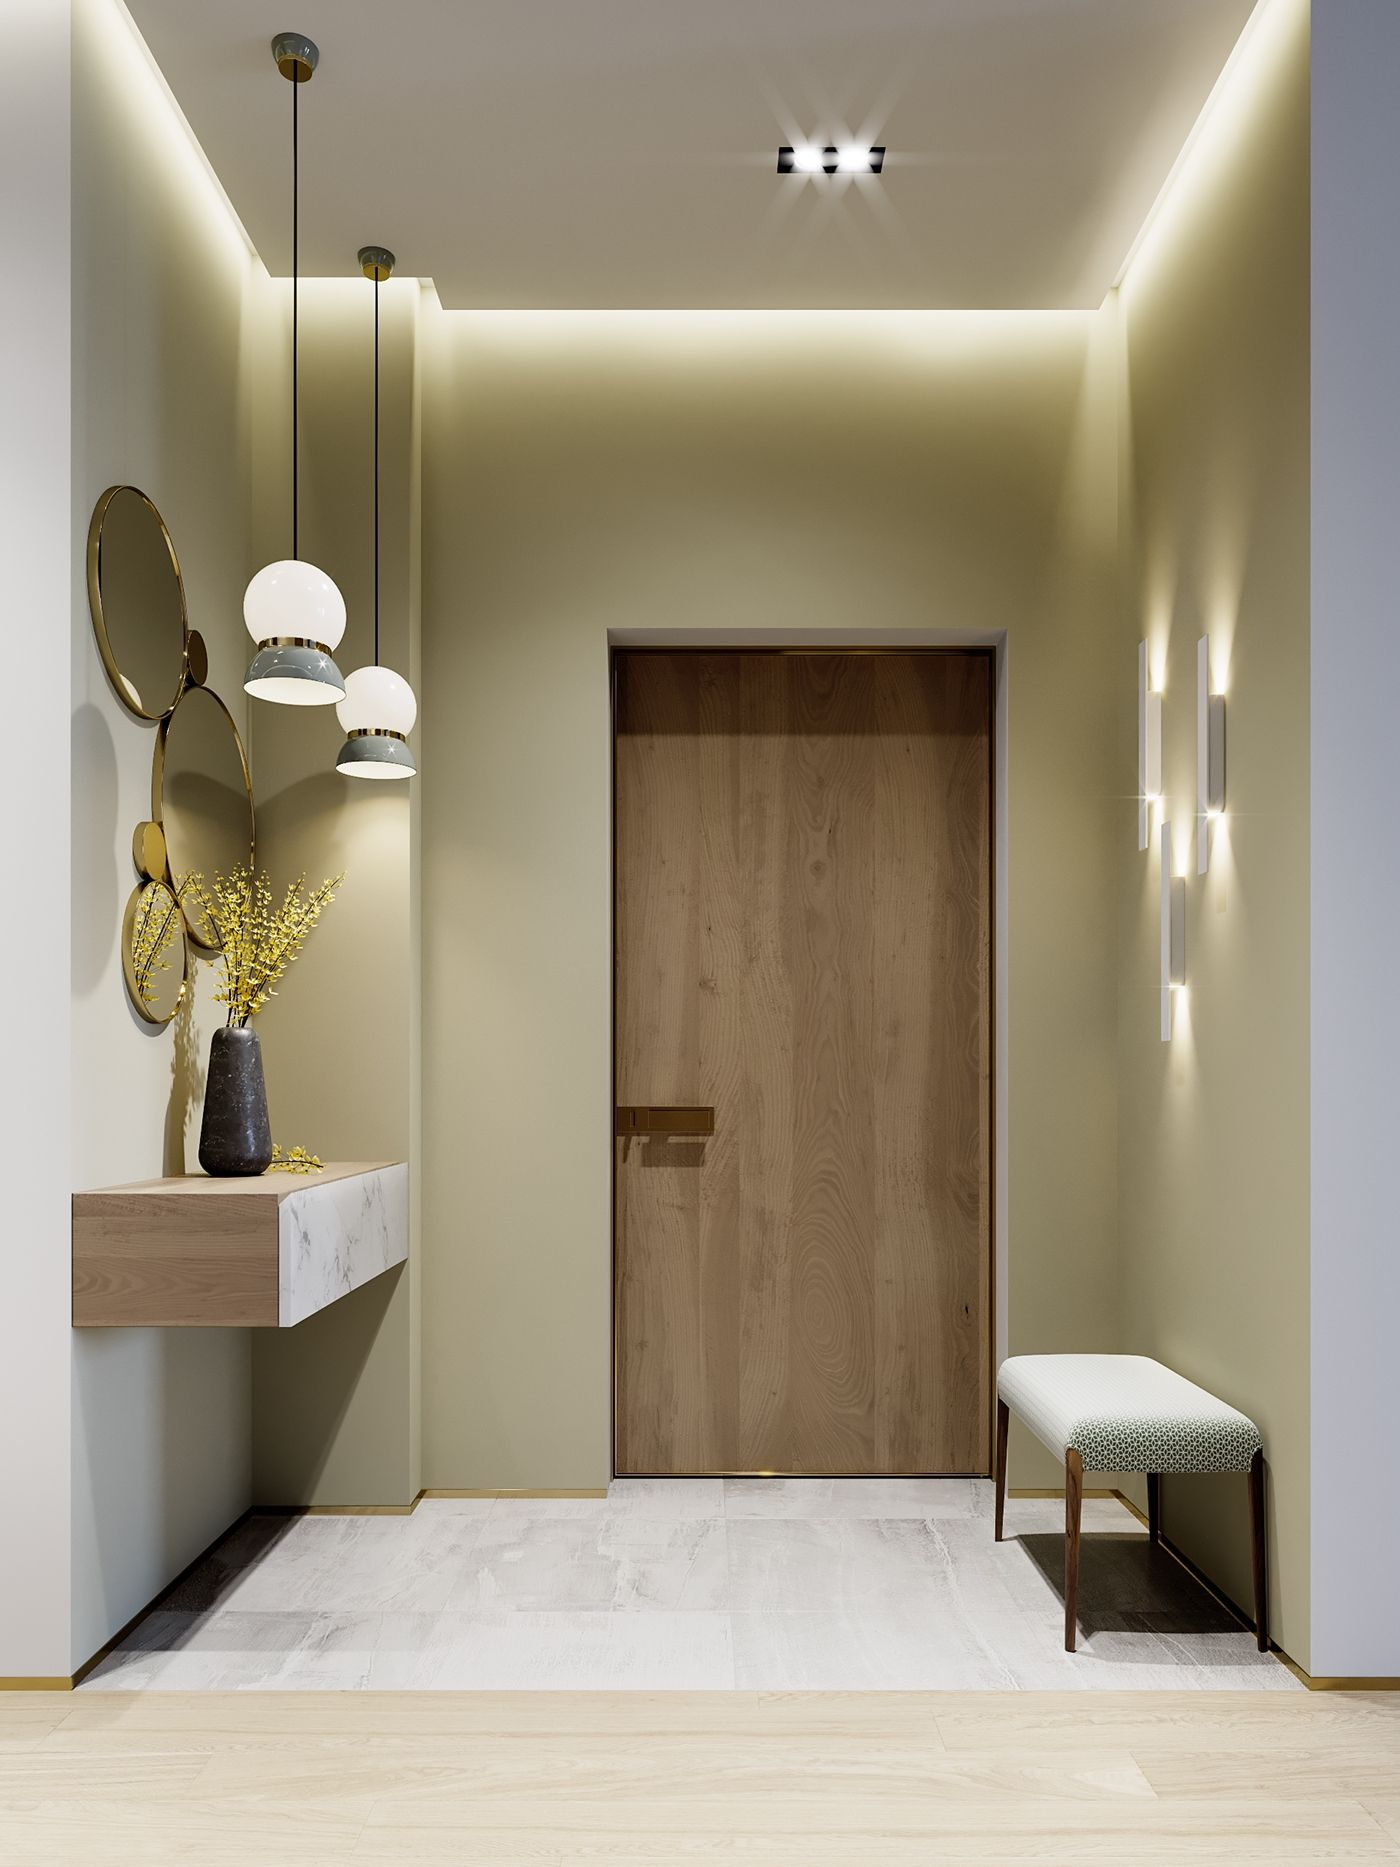 Autodesk Room Design: Design, Luxury Home Decor